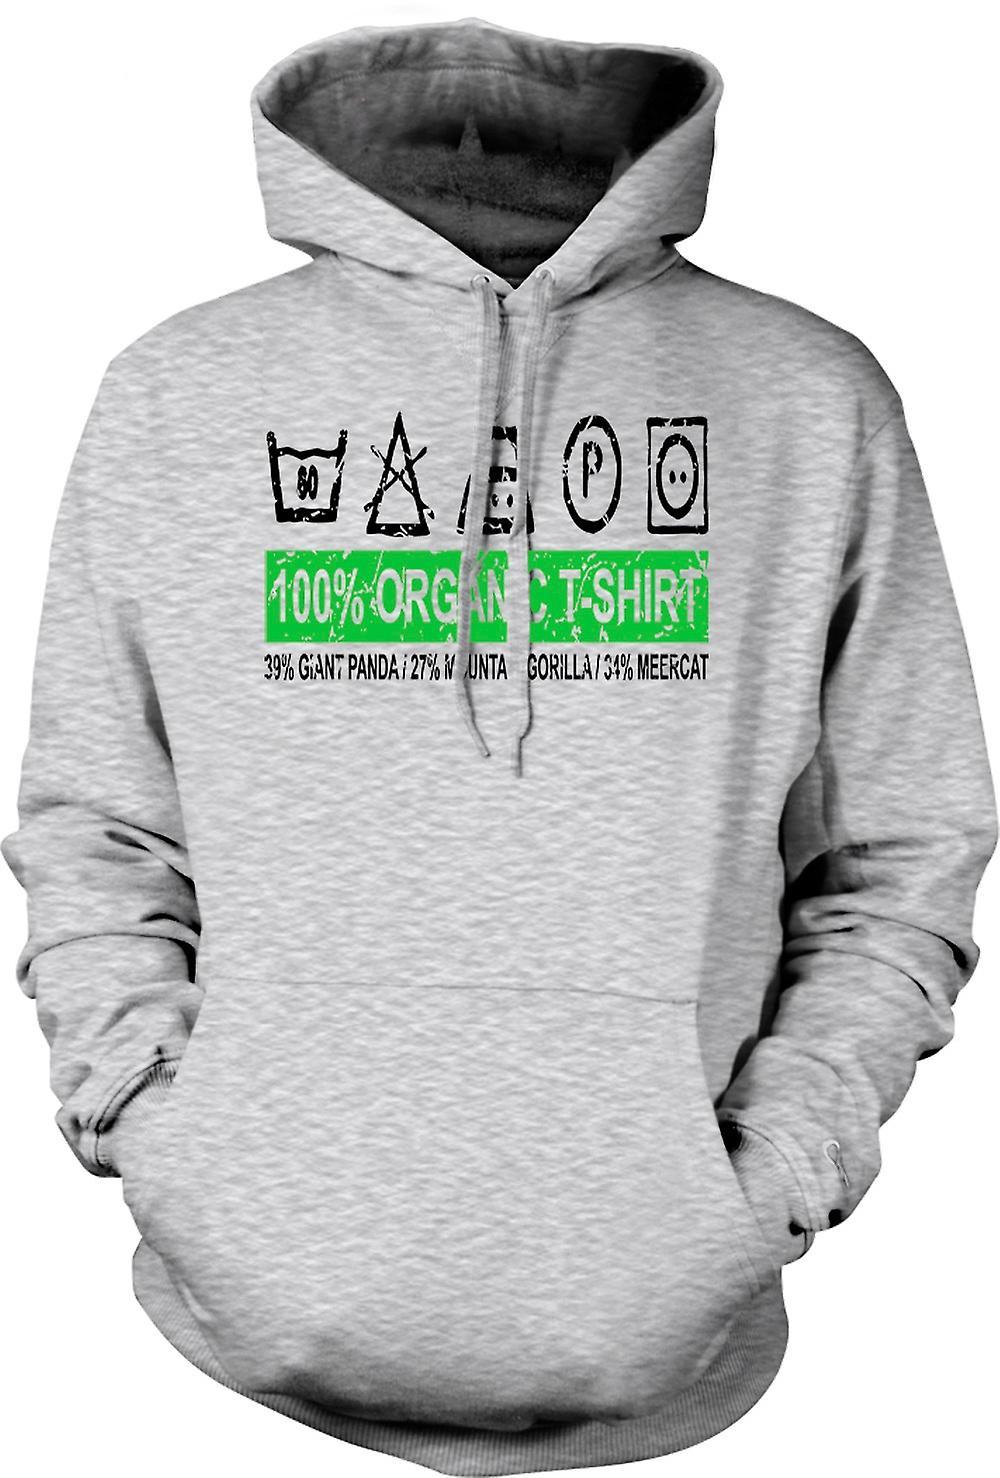 Mens Hoodie - 100% T-shirt Bio - 39% du panda géant